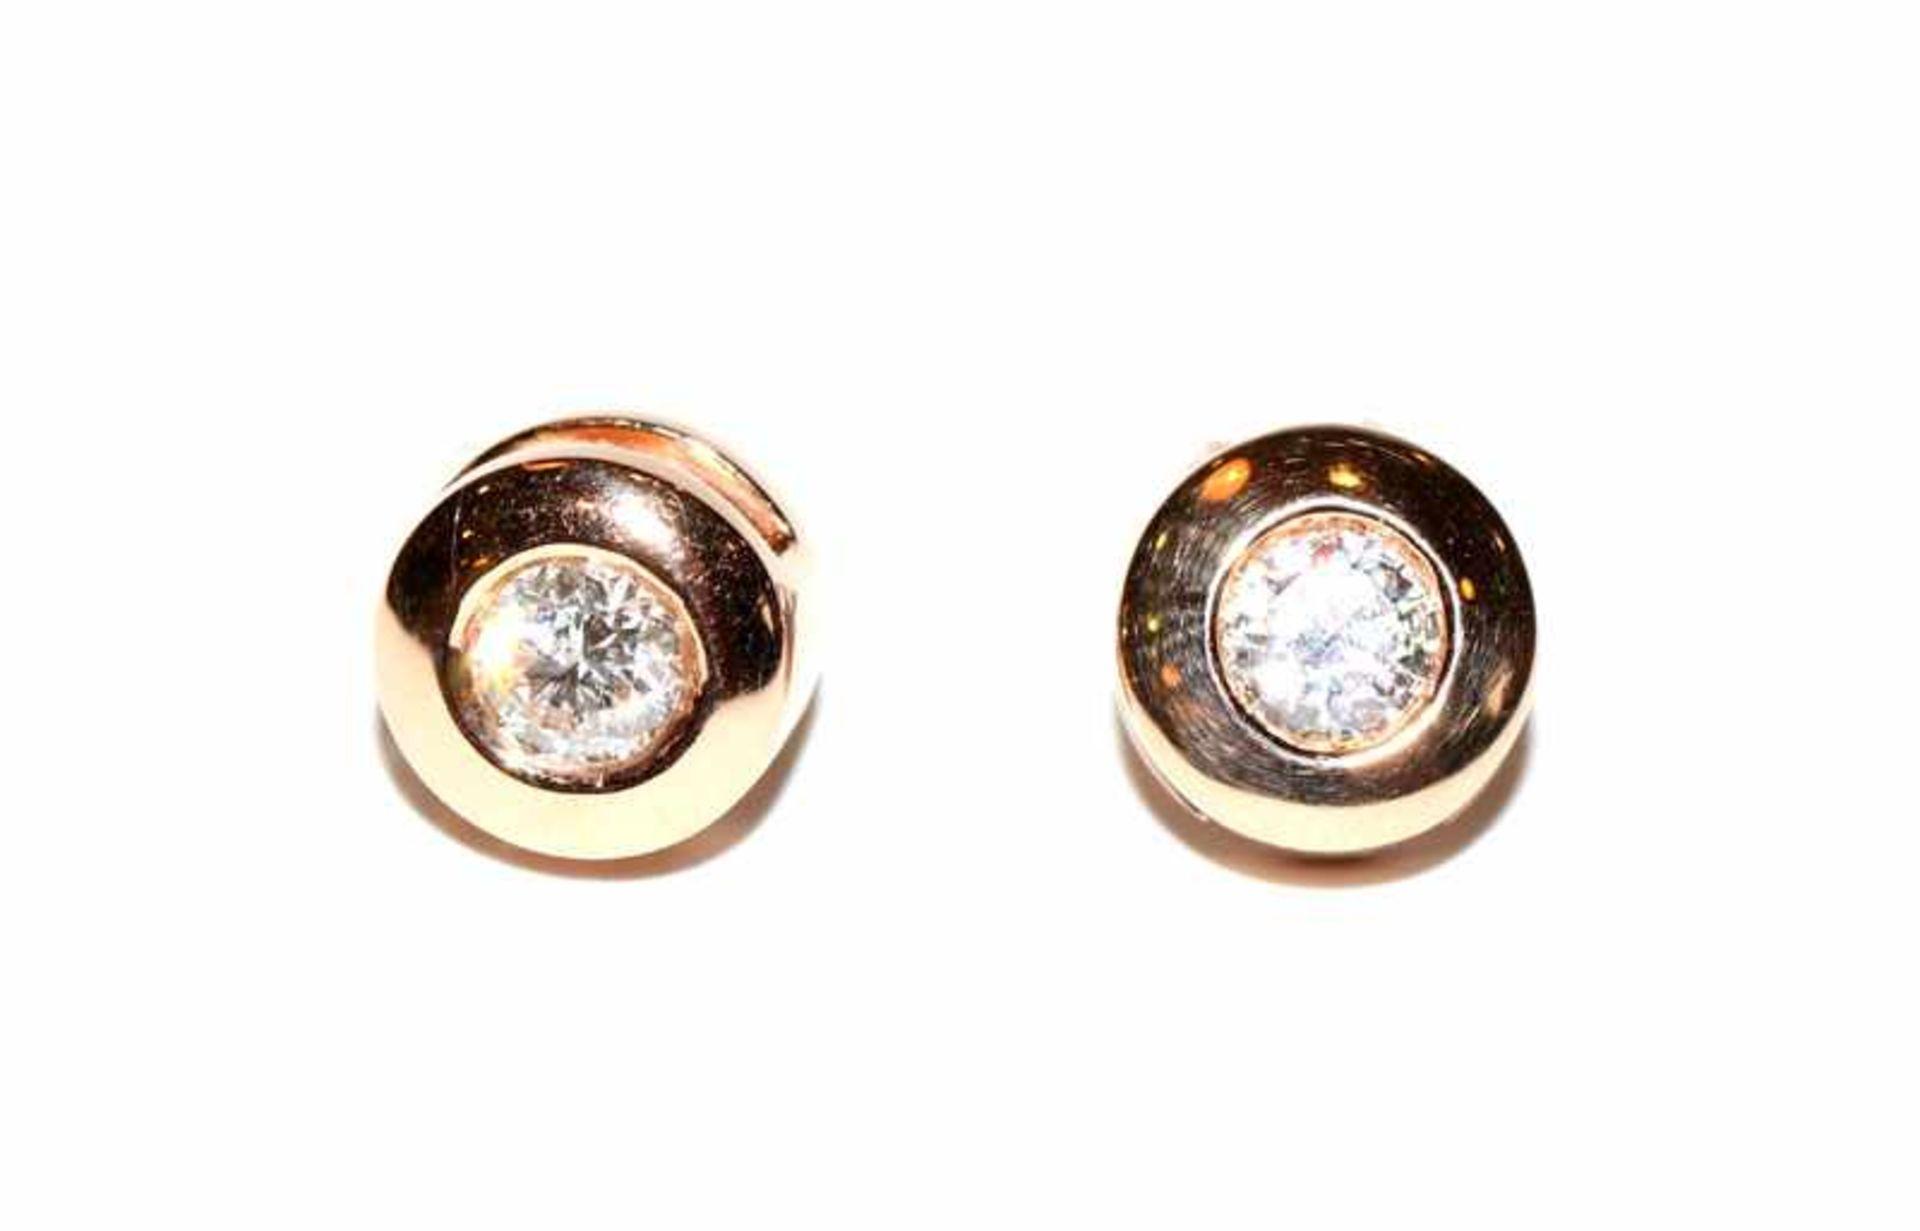 Paar 14 k Roségold Ohrstecker mit zus. ca. 1 ct. Diamanten